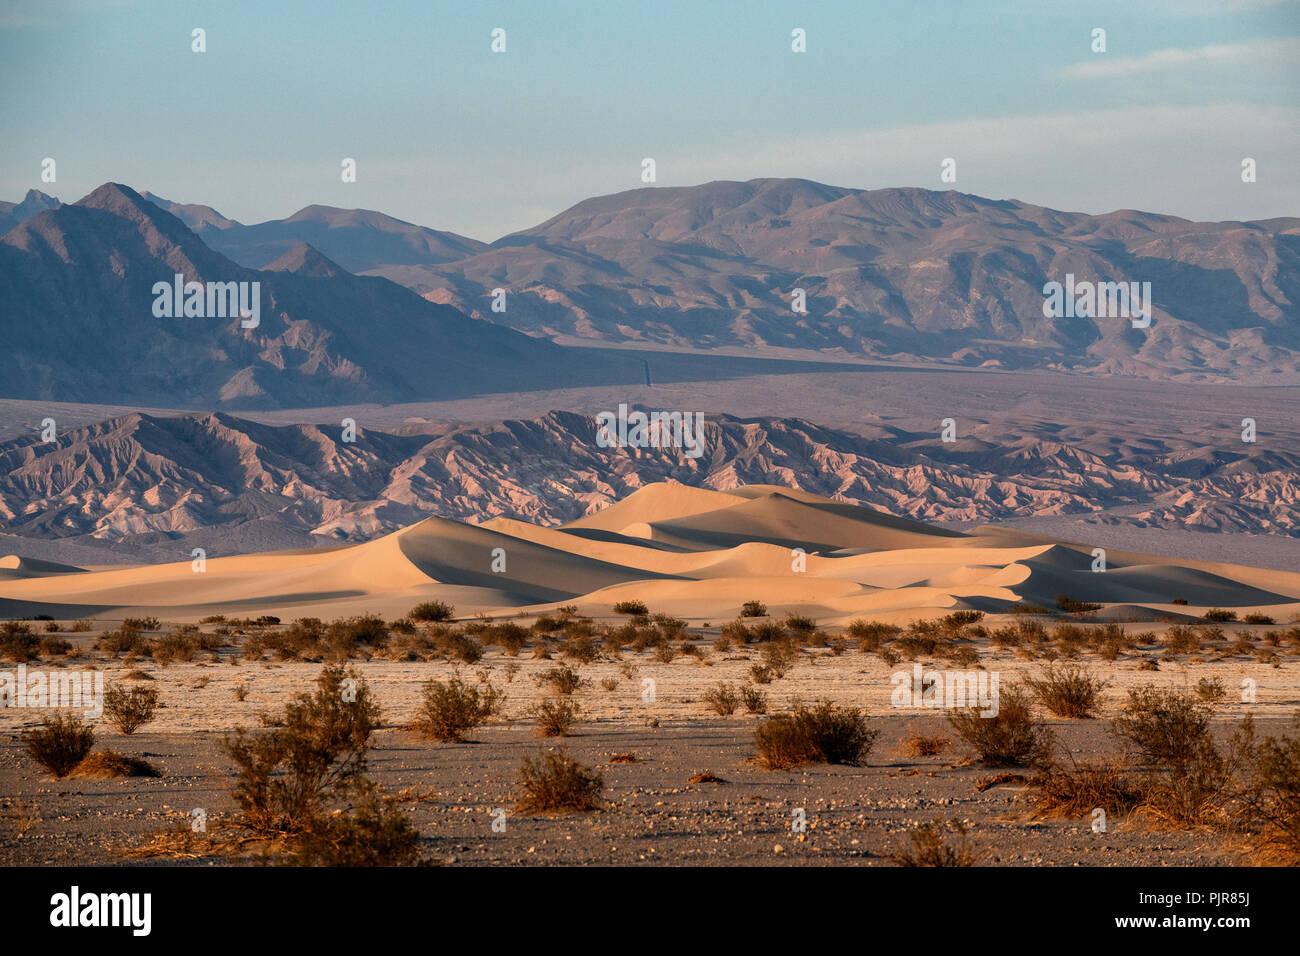 Mesquite Flat Sand Dunes, Amargosa Range in distance, sunset, Death Valley National Park, California, USA - Stock Image